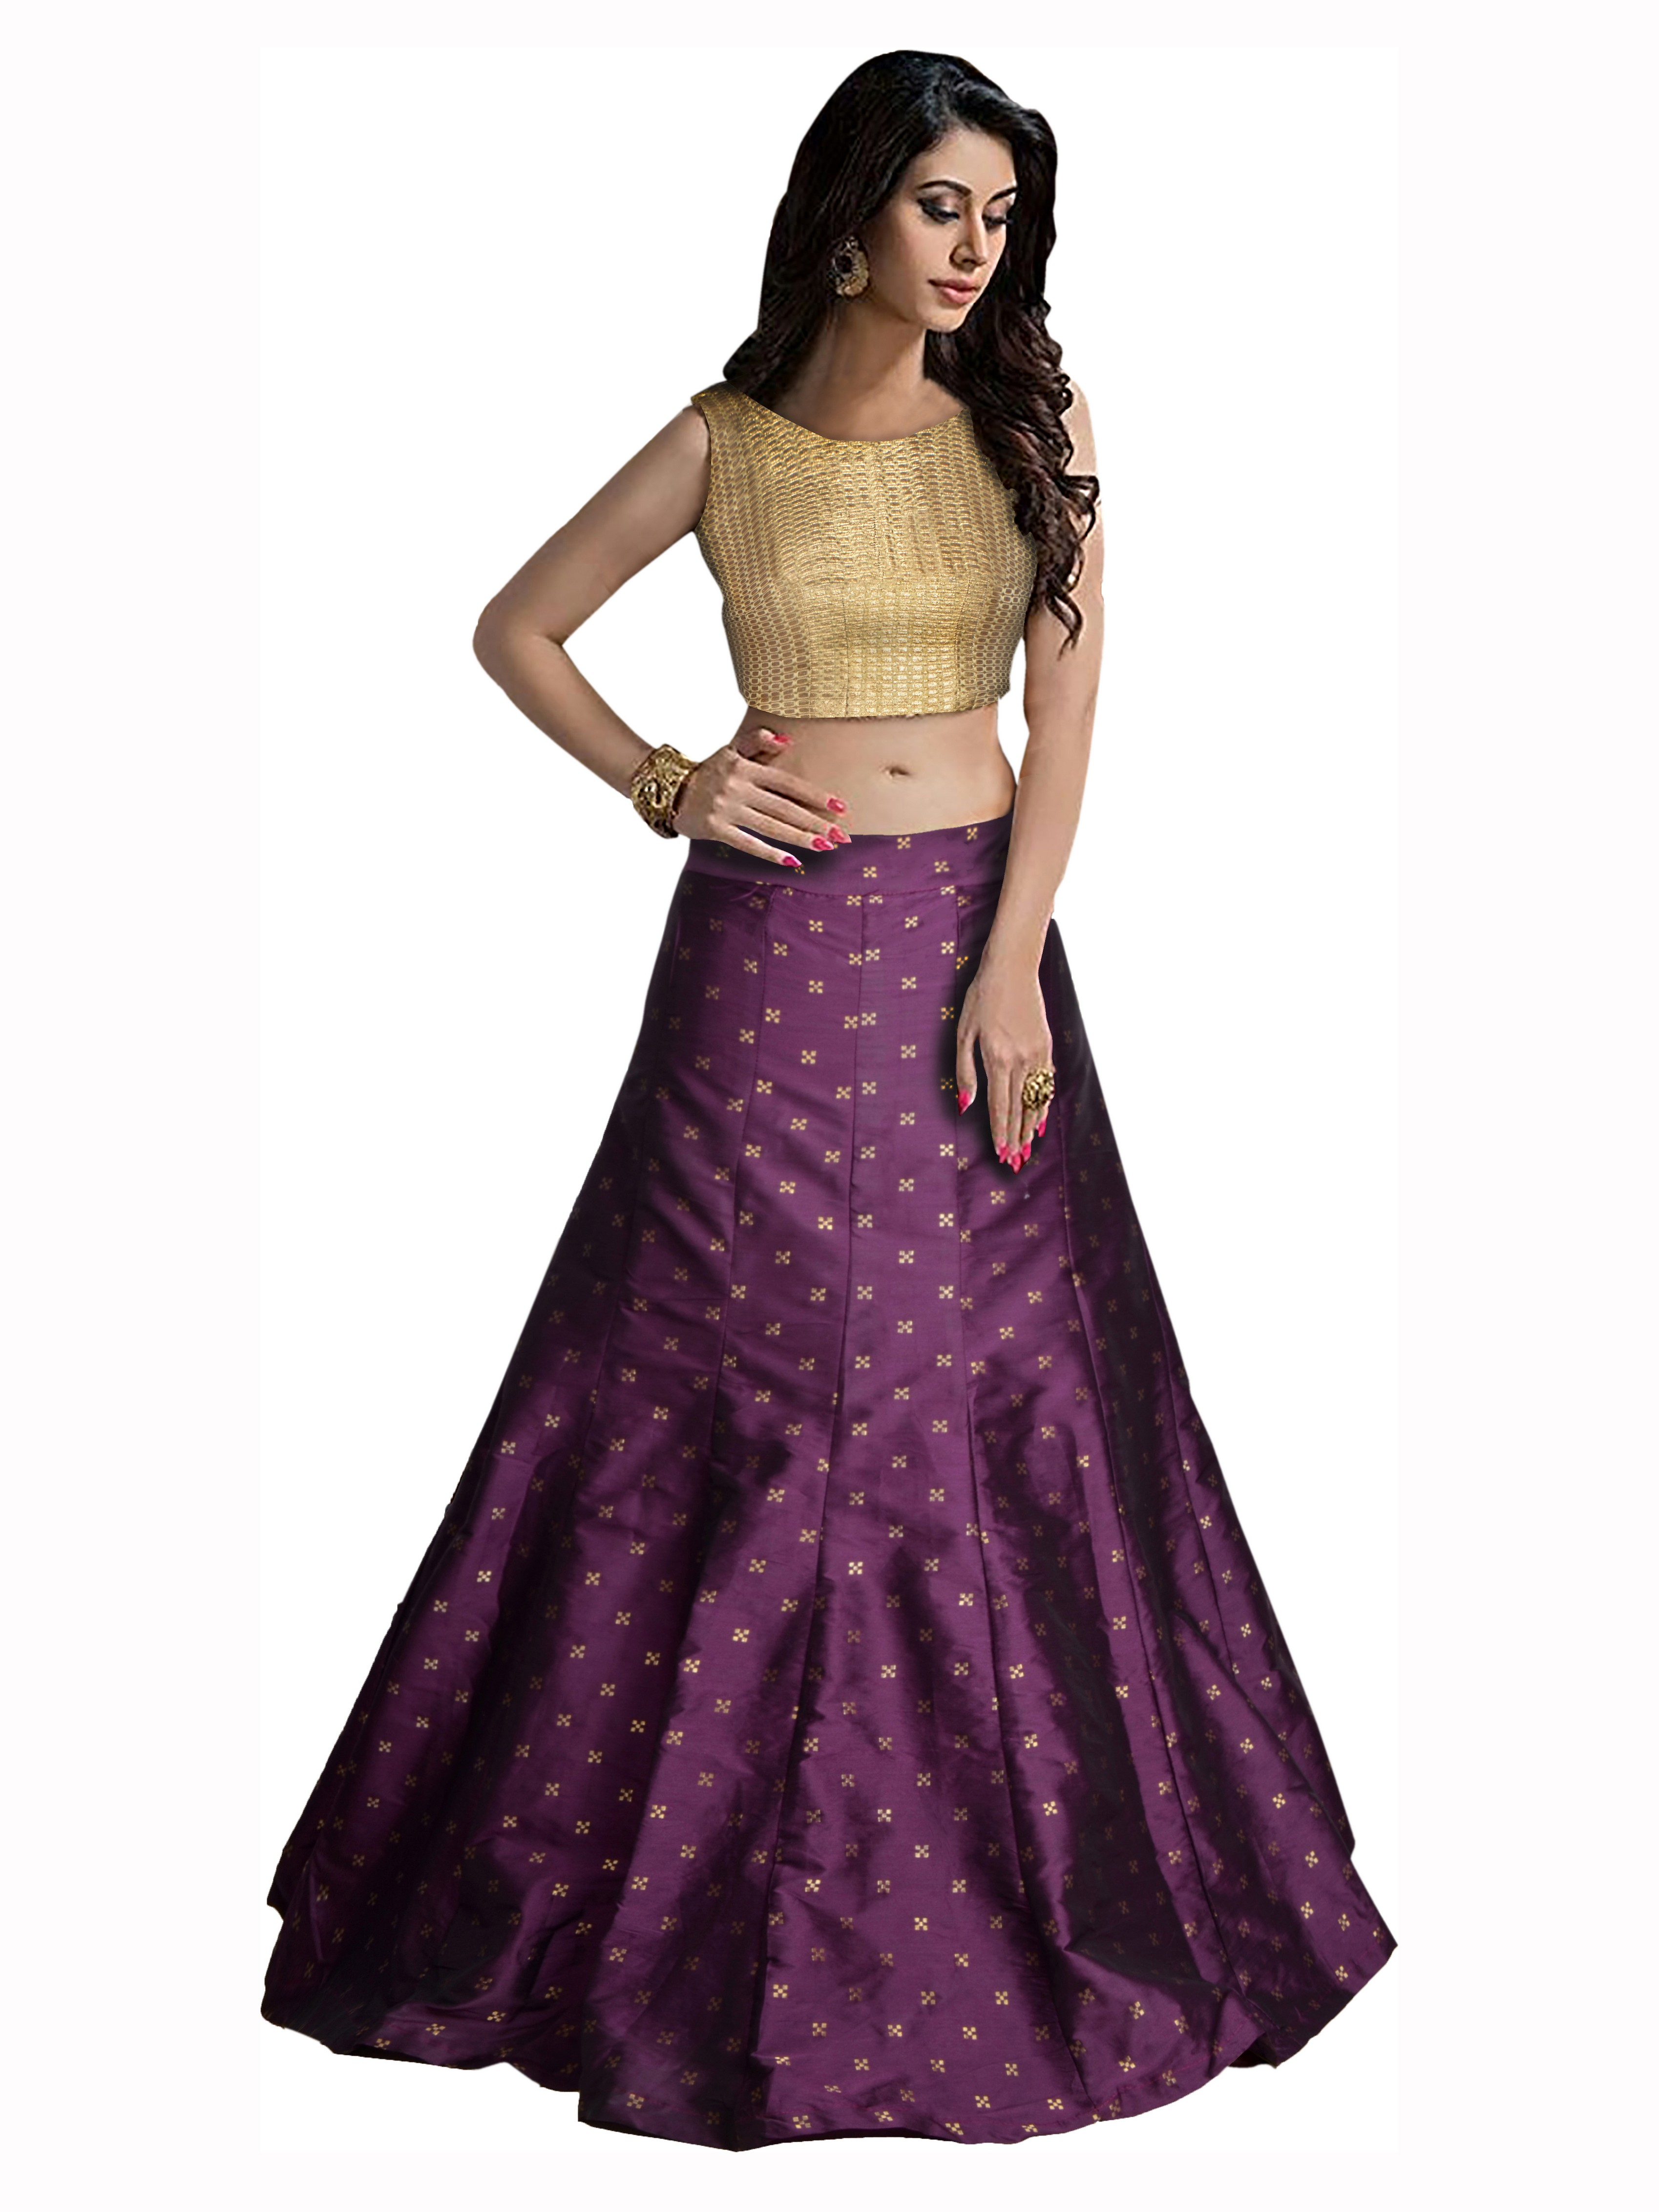 083e2f35bbe63 Purple and gold taffeta silk printed designer lehenga choli - Vastrang -  2486218